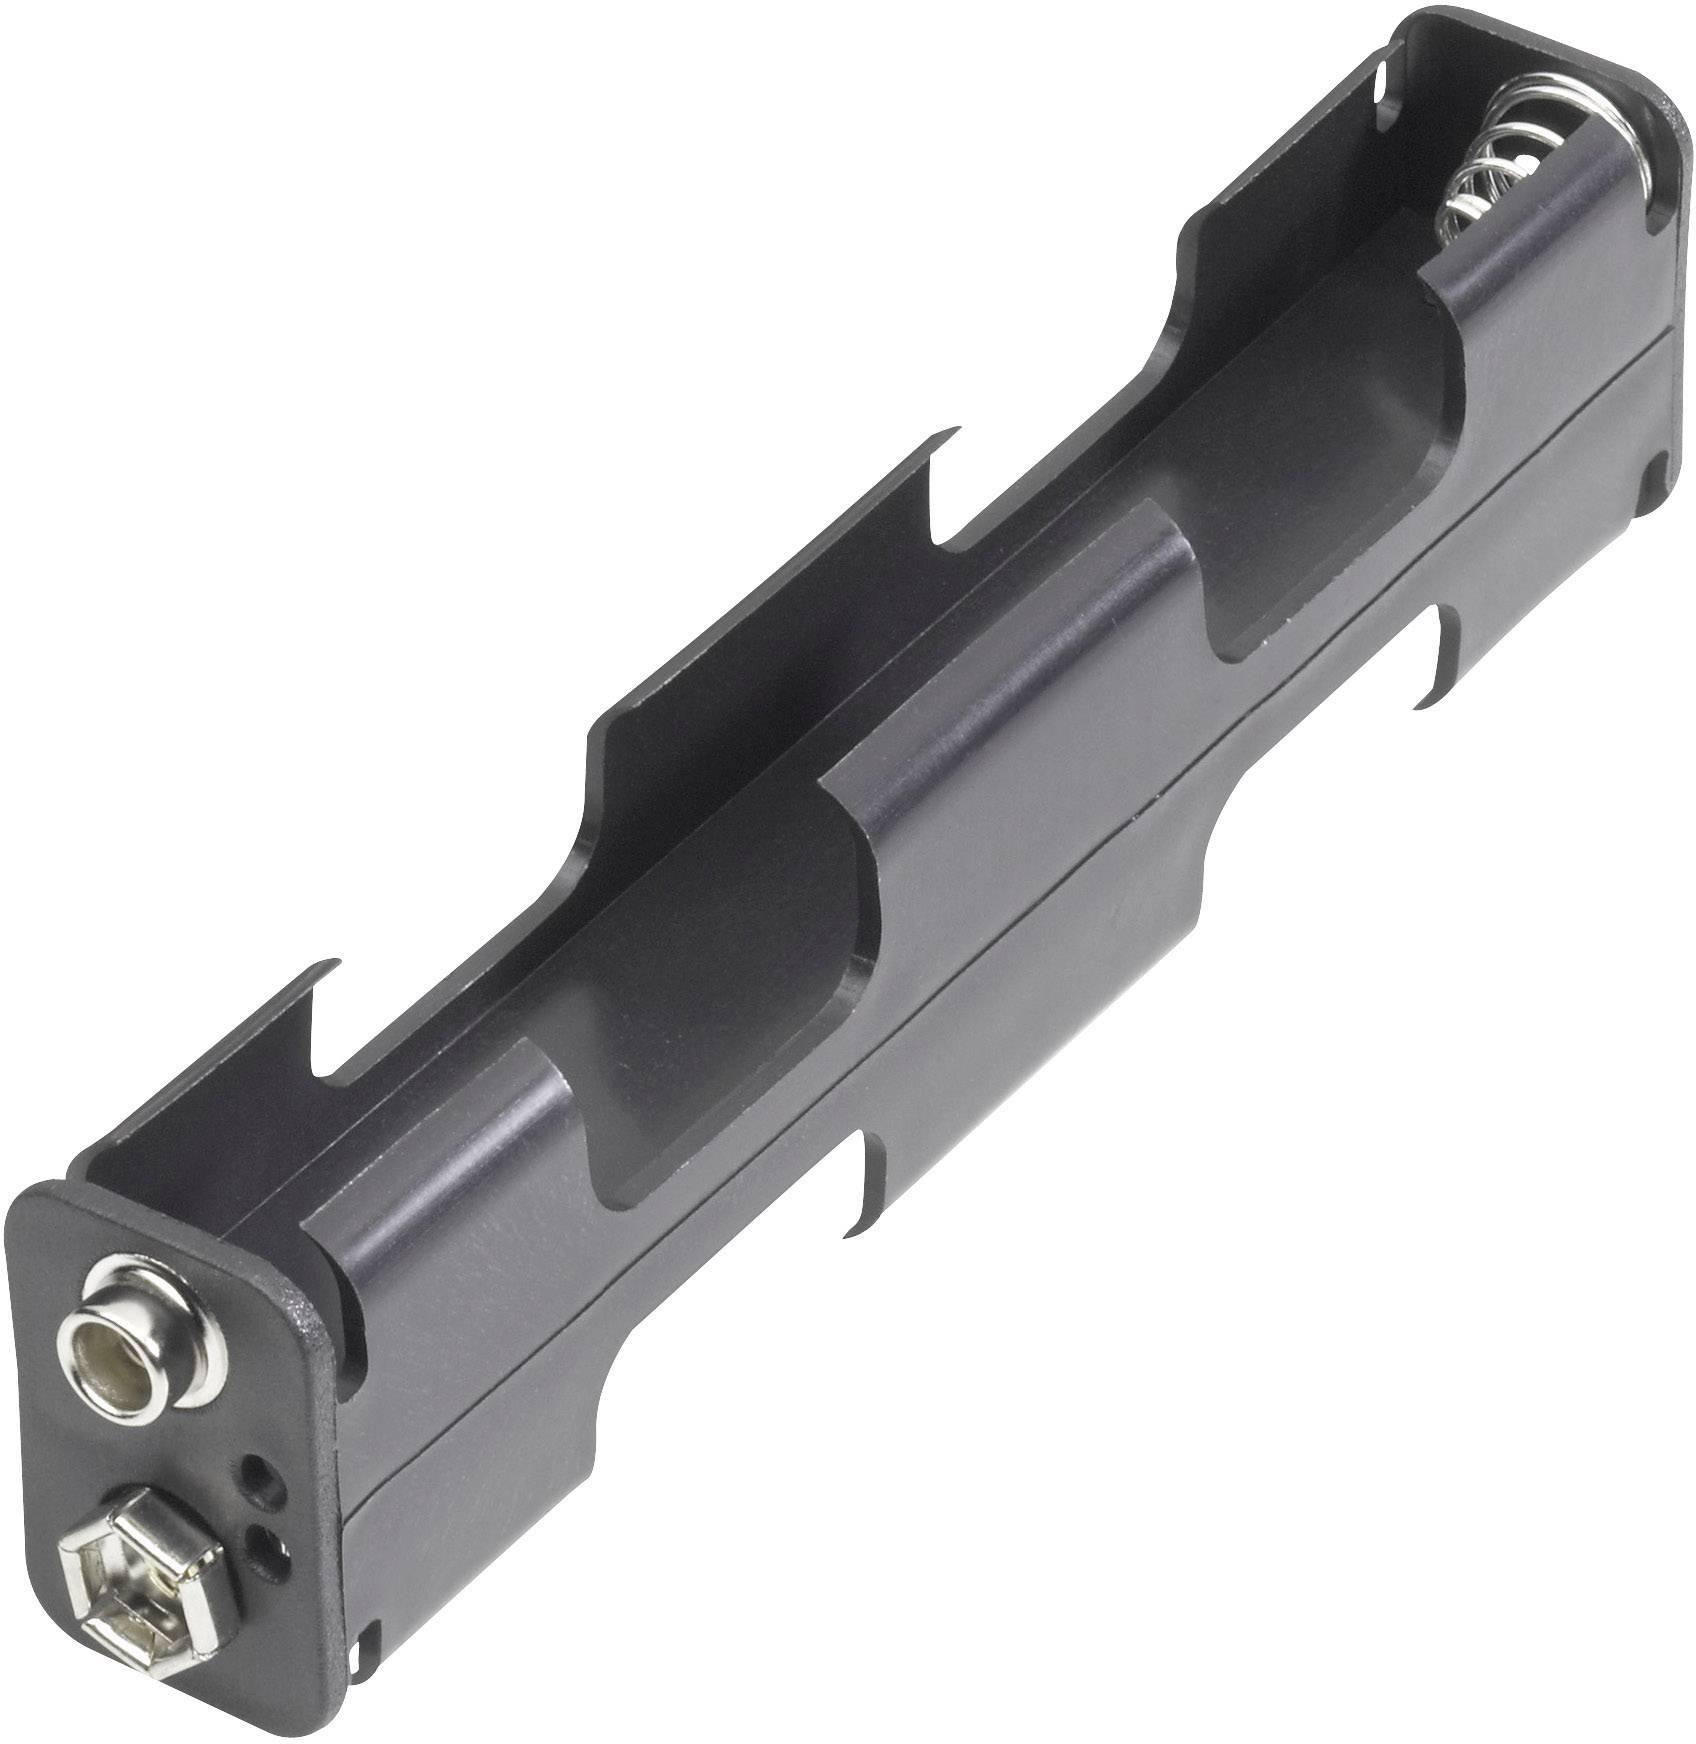 Batériový držák na 4x mignon (AA) Goobay 10881, (d x š x v) 110 x 26 x 16 mm